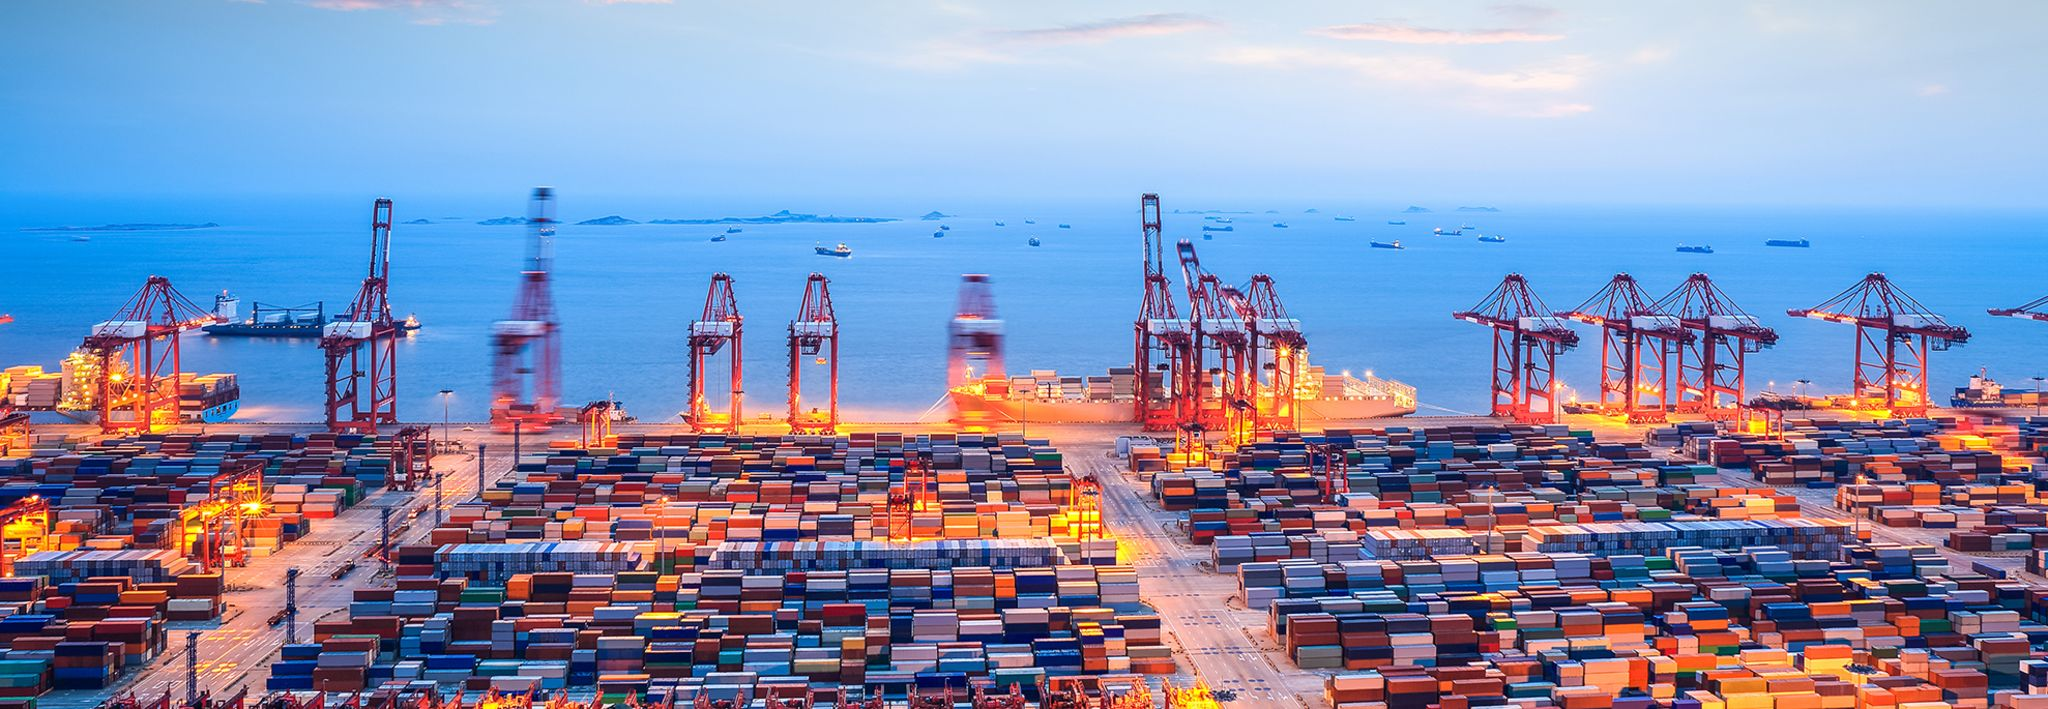 International shipping yard at dusk.